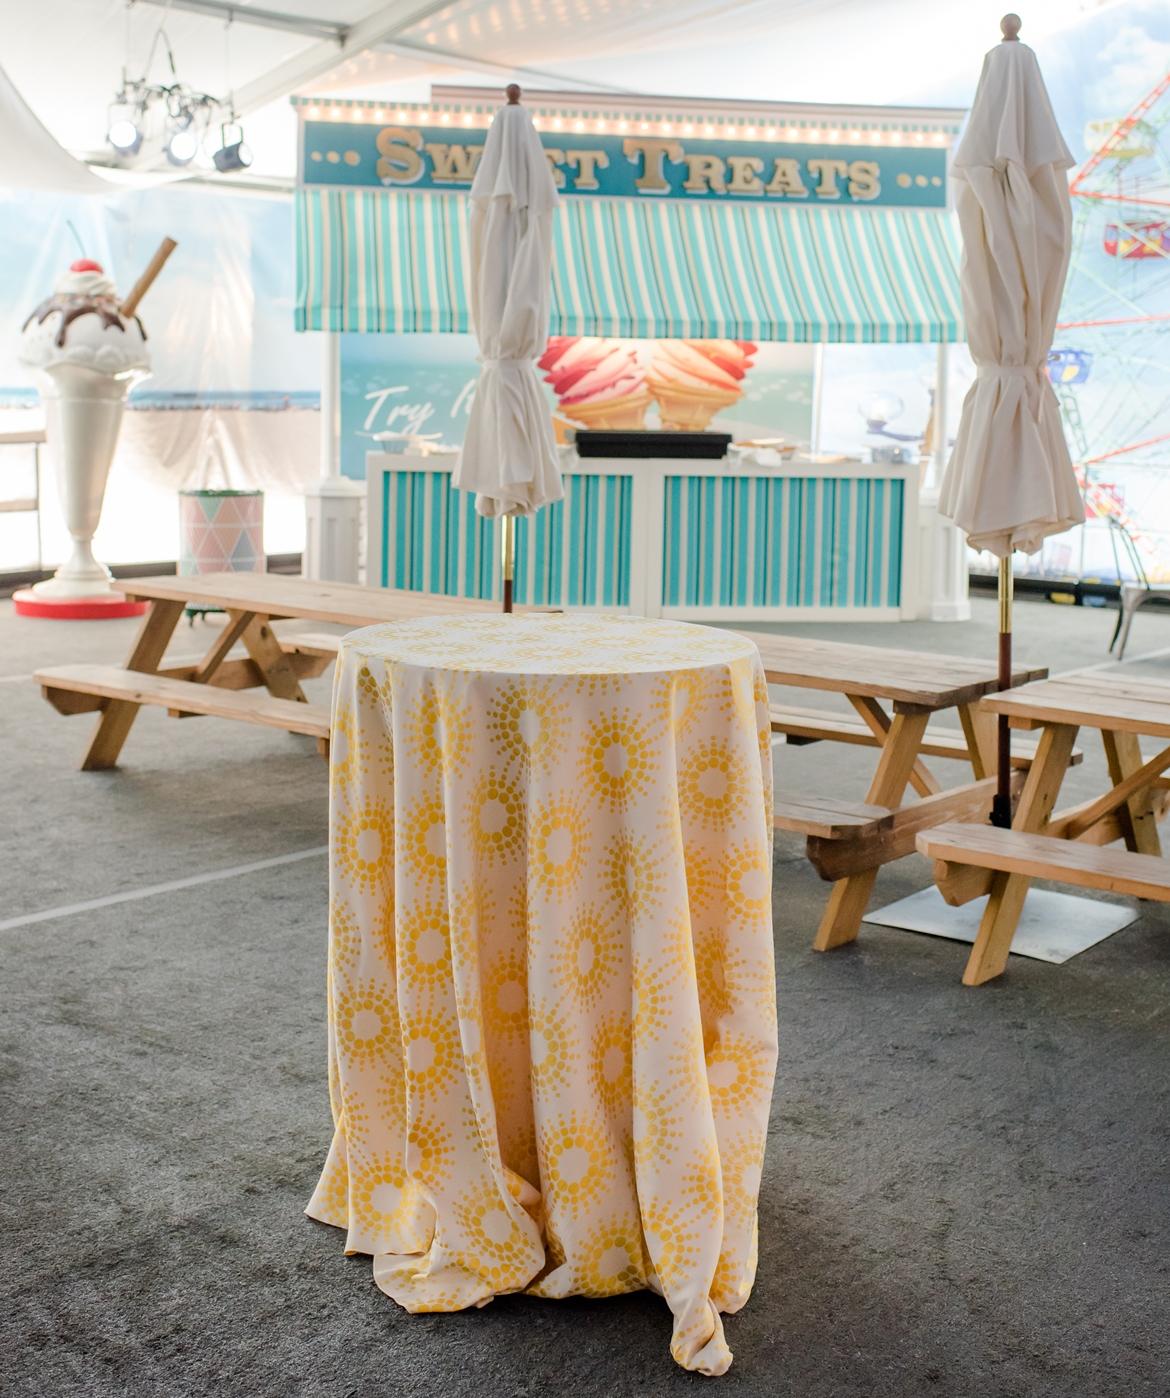 Gallery image for Sunburst Yellow